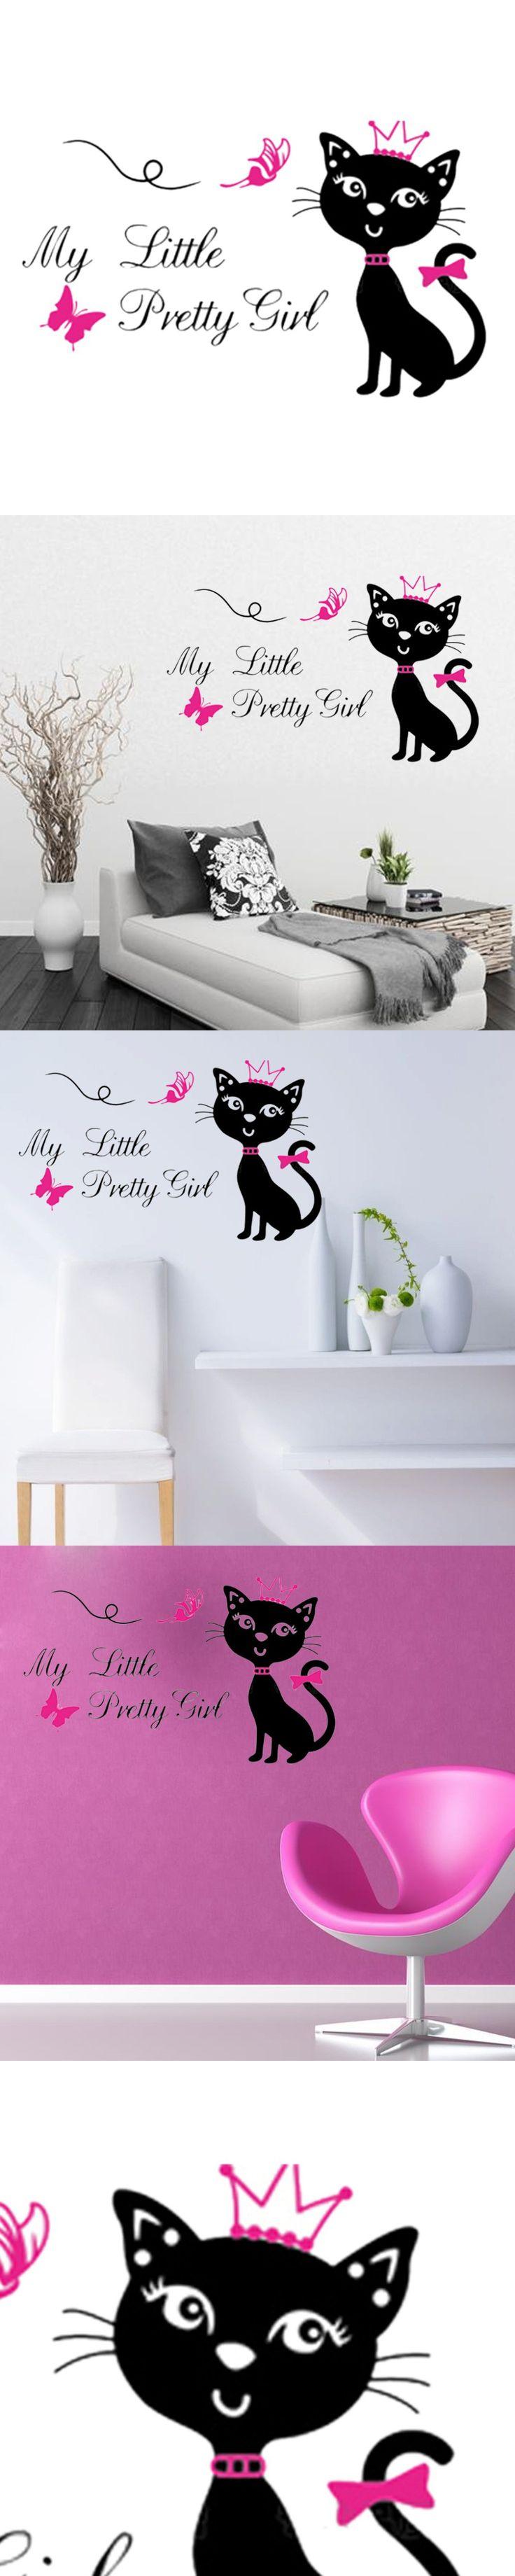 Hello Kitty Zebra Wall Decals - 60 33cm cat vinyl wall sticker home decor removable cartoon wall decals art diy muraux